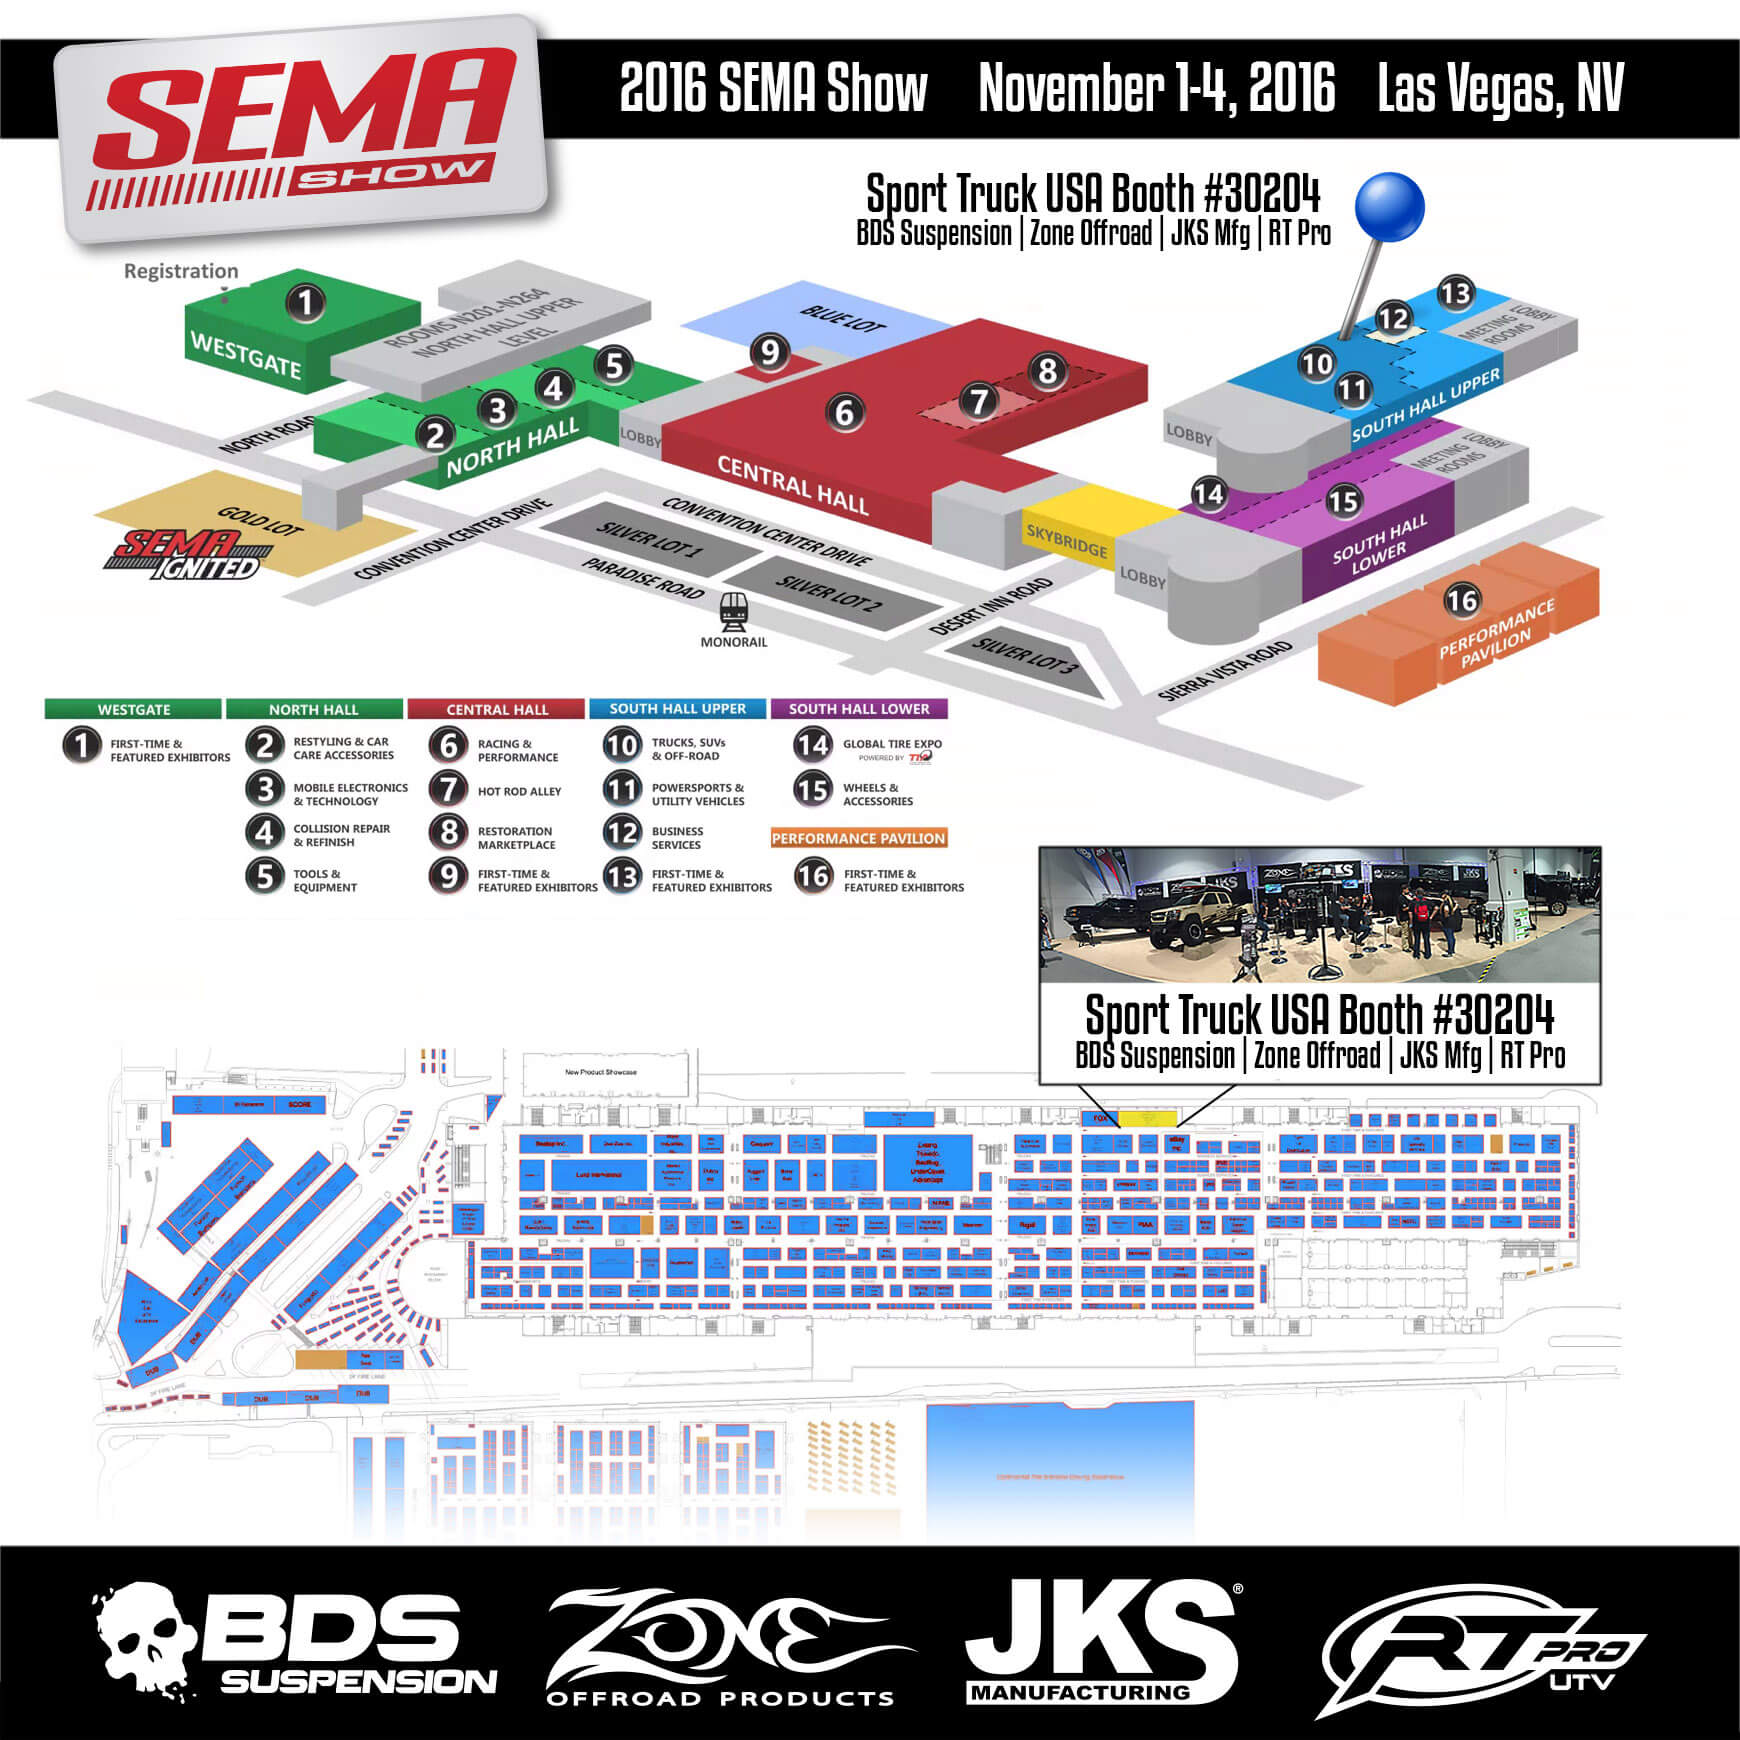 2016 SEMA Show | Sport Truck USA